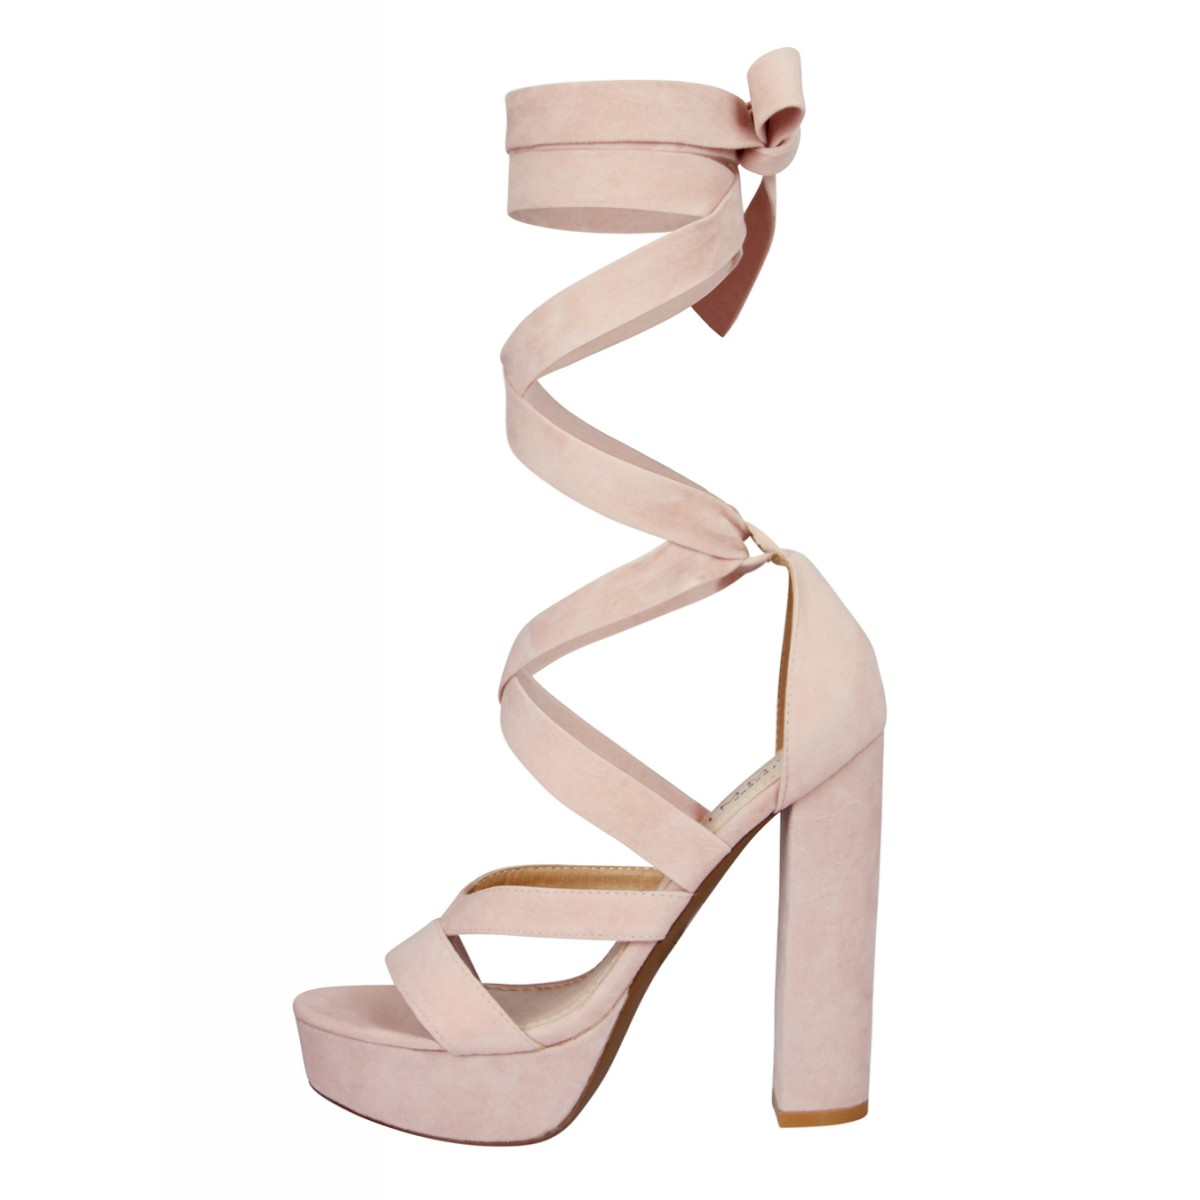 Amelia Nude Suede Lace Up Platform Heels : Simmi Shoes